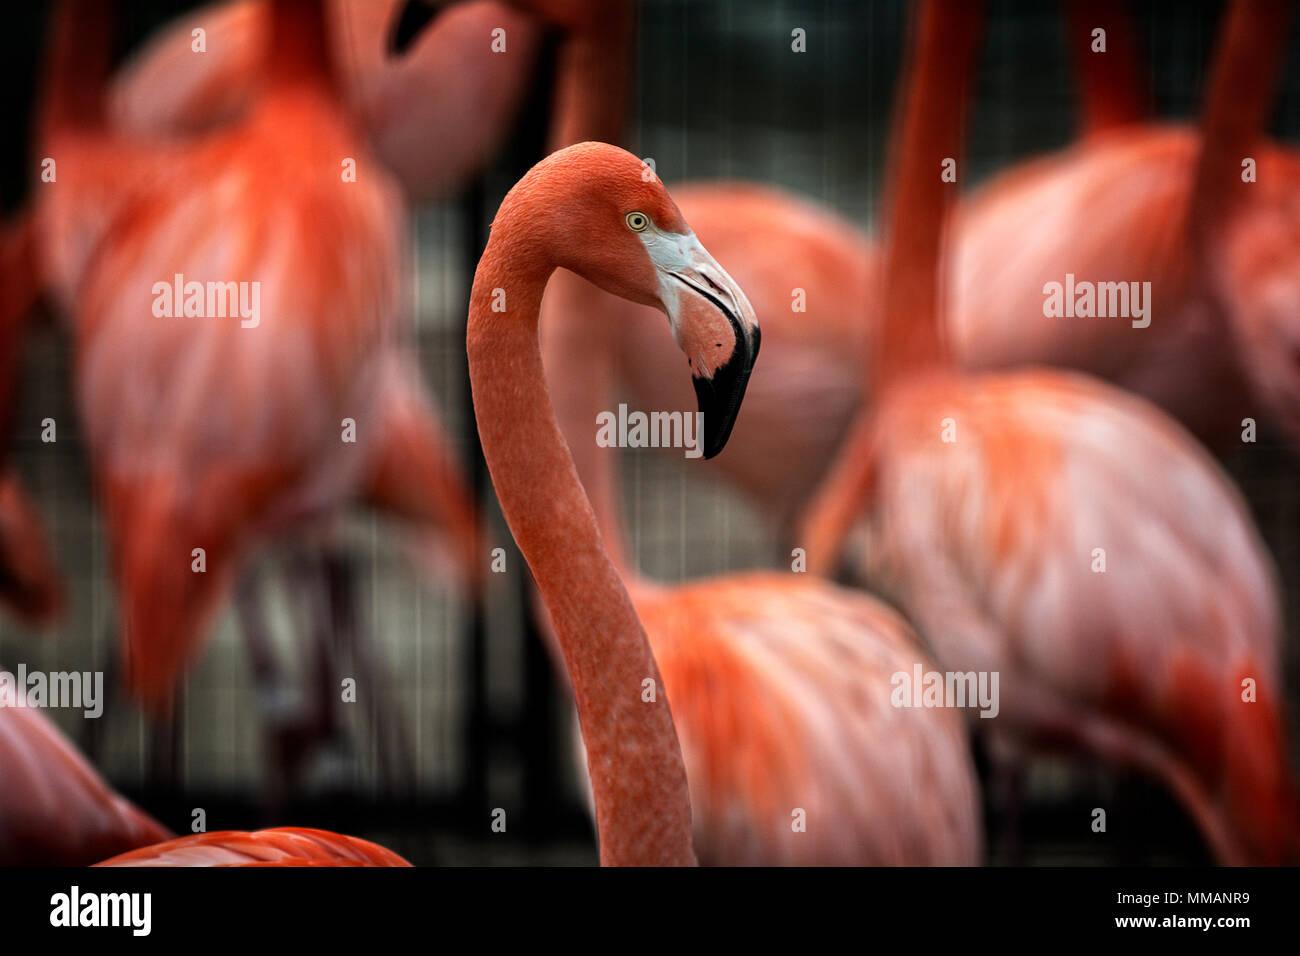 An elegant Flamingo bird standing in a flock. - Stock Image